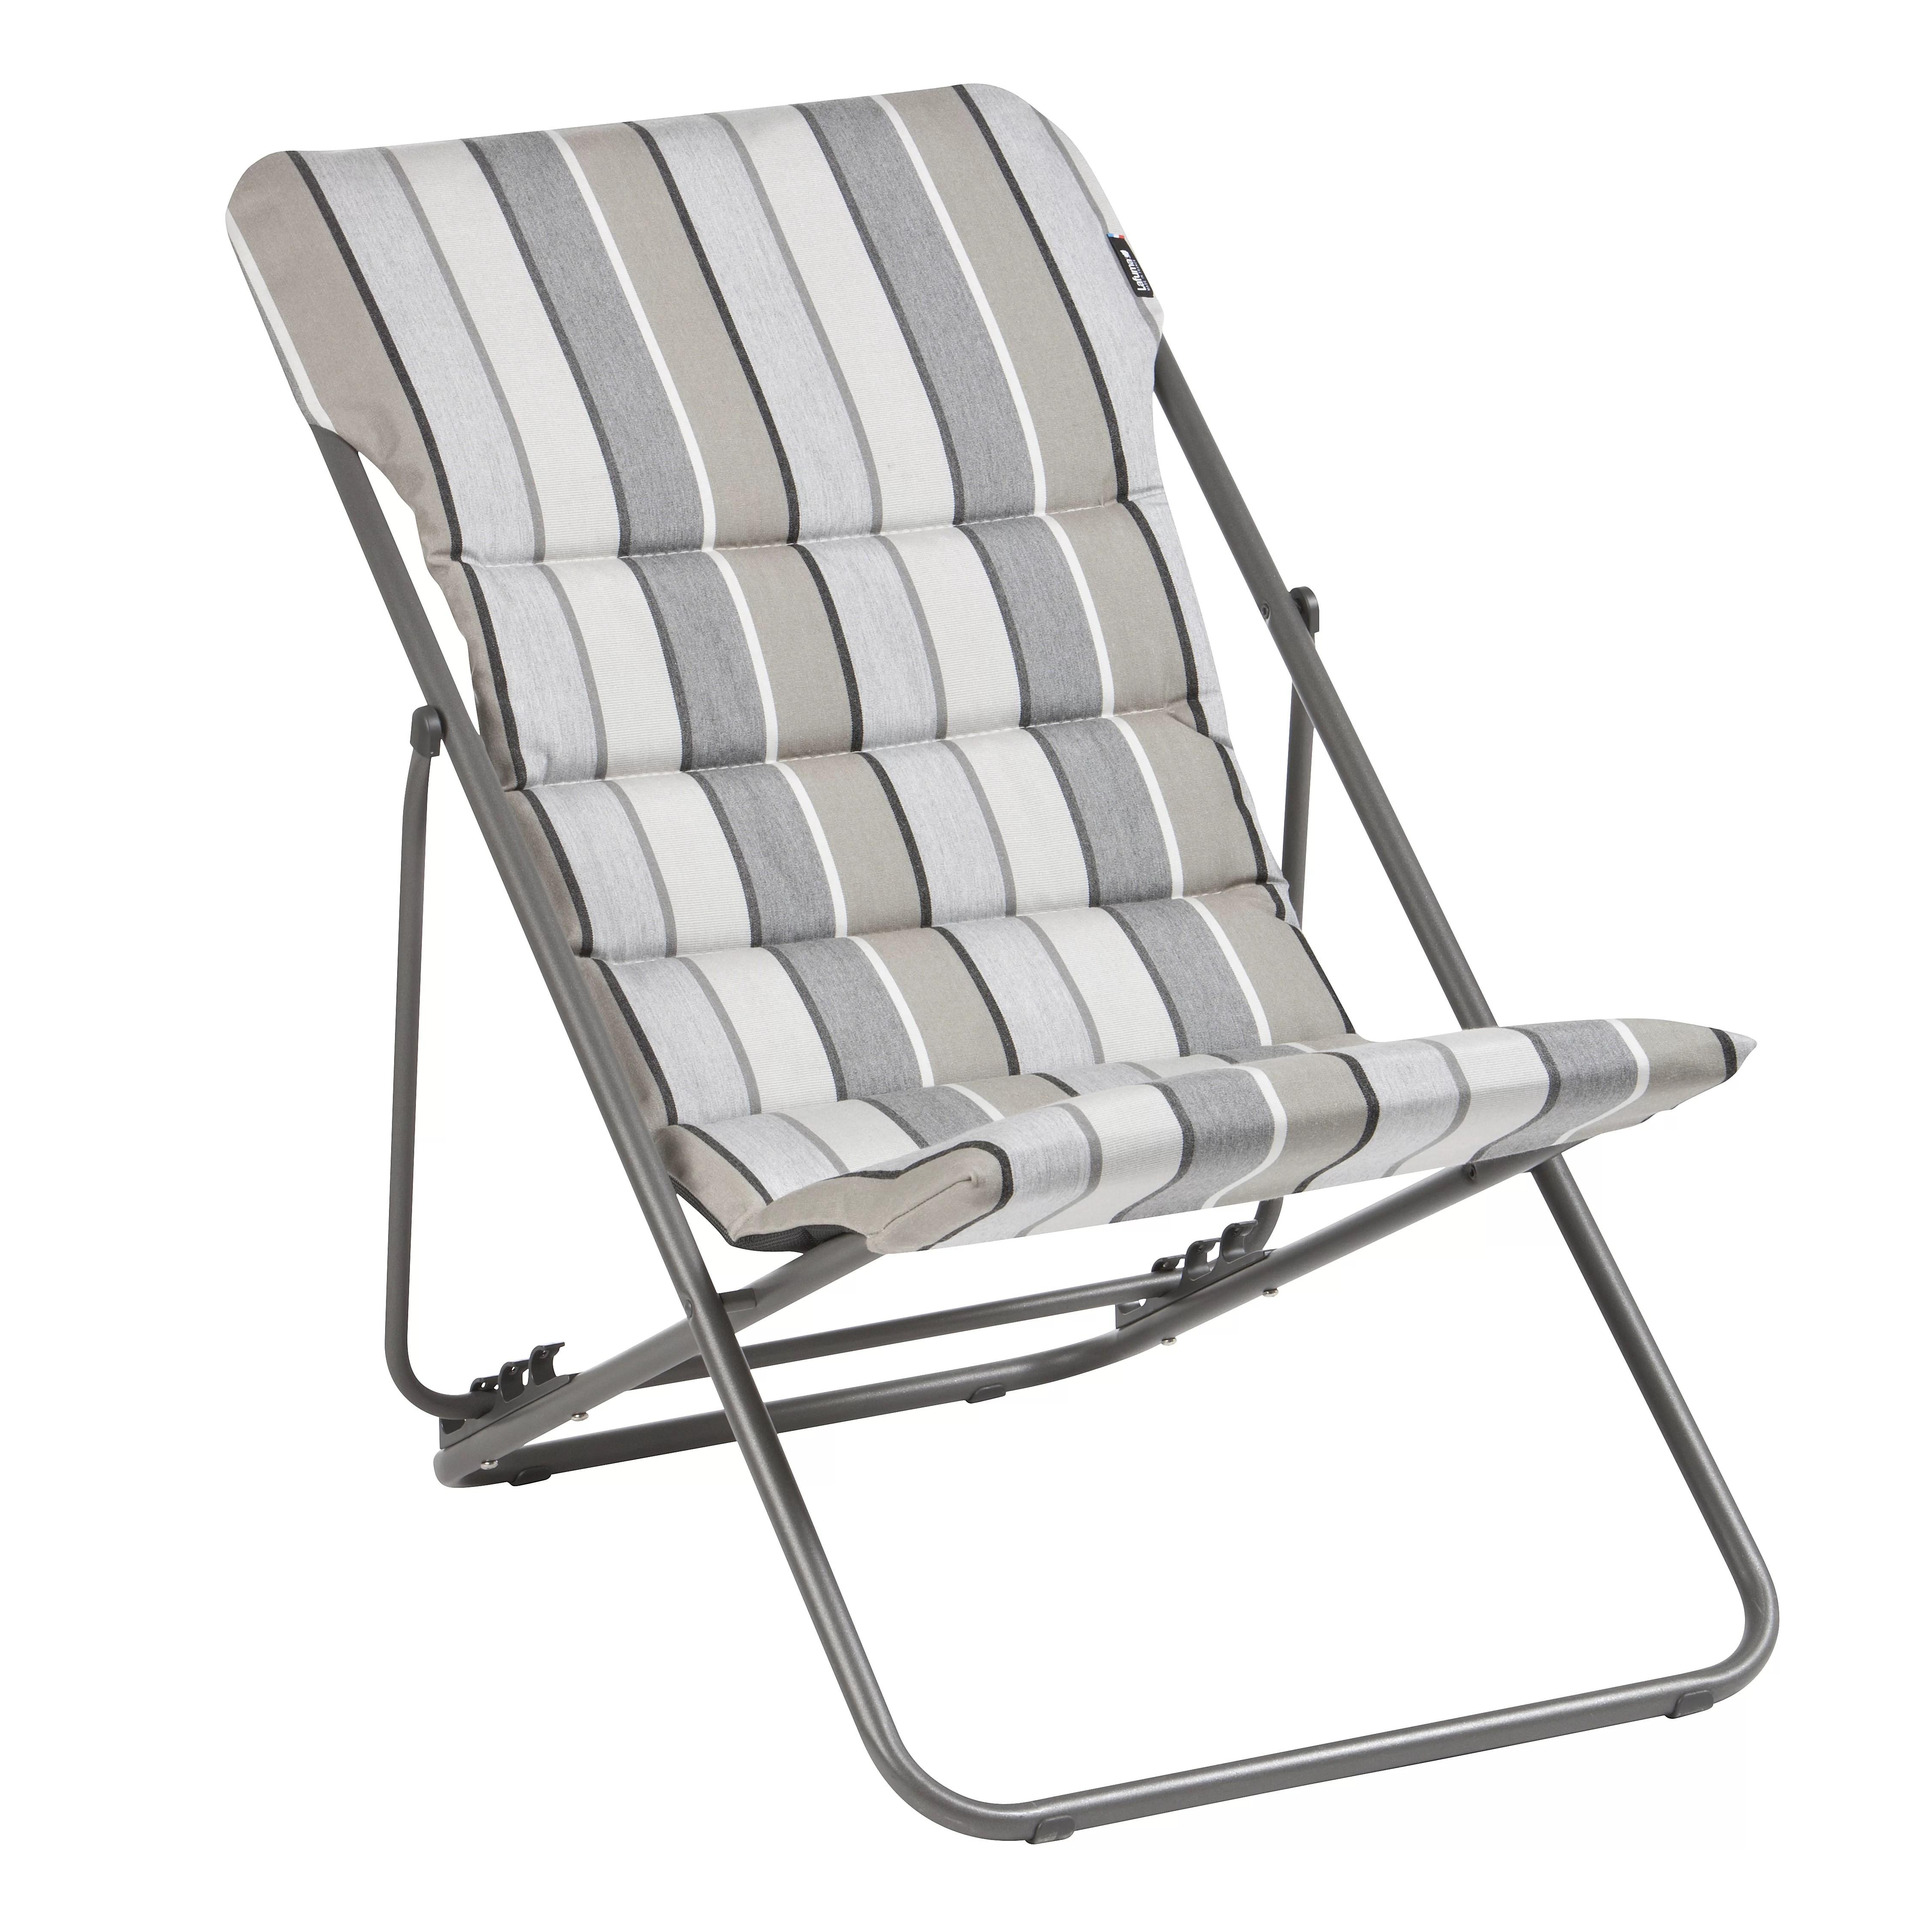 folding sling chair canada wicker patio with hidden ottoman maxi transat wayfair